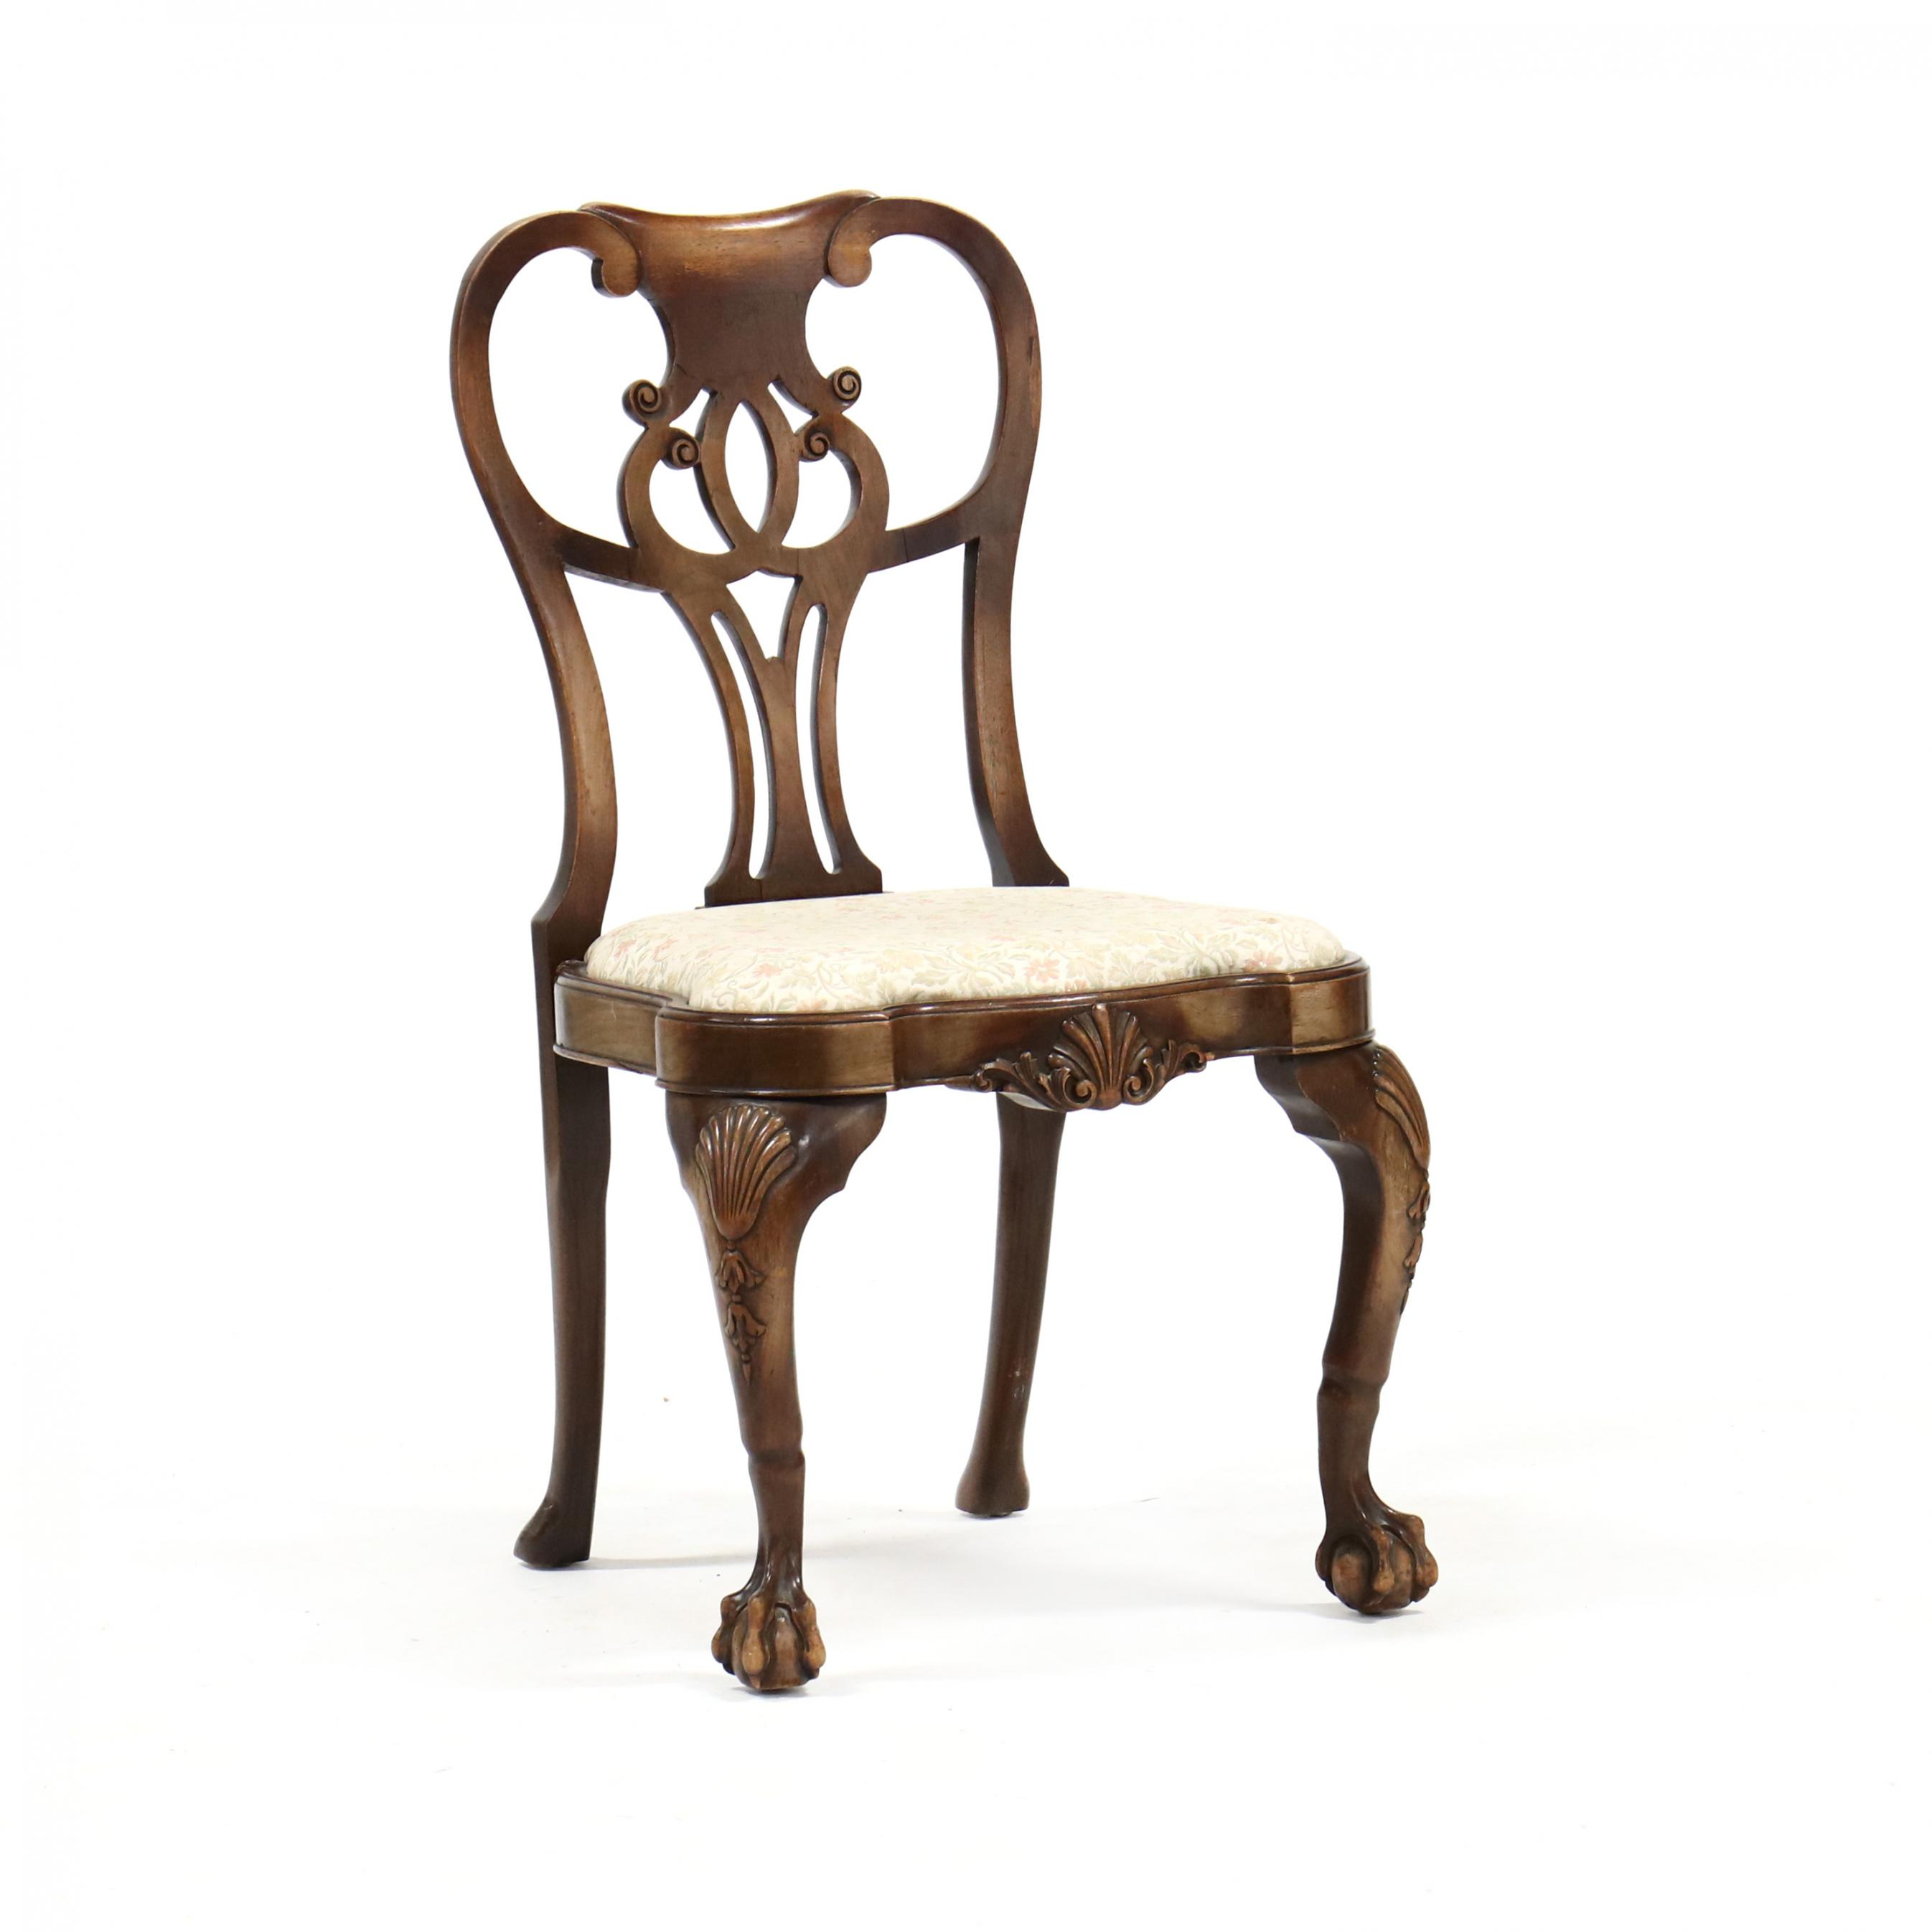 irish-chippendale-style-mahogany-side-chair